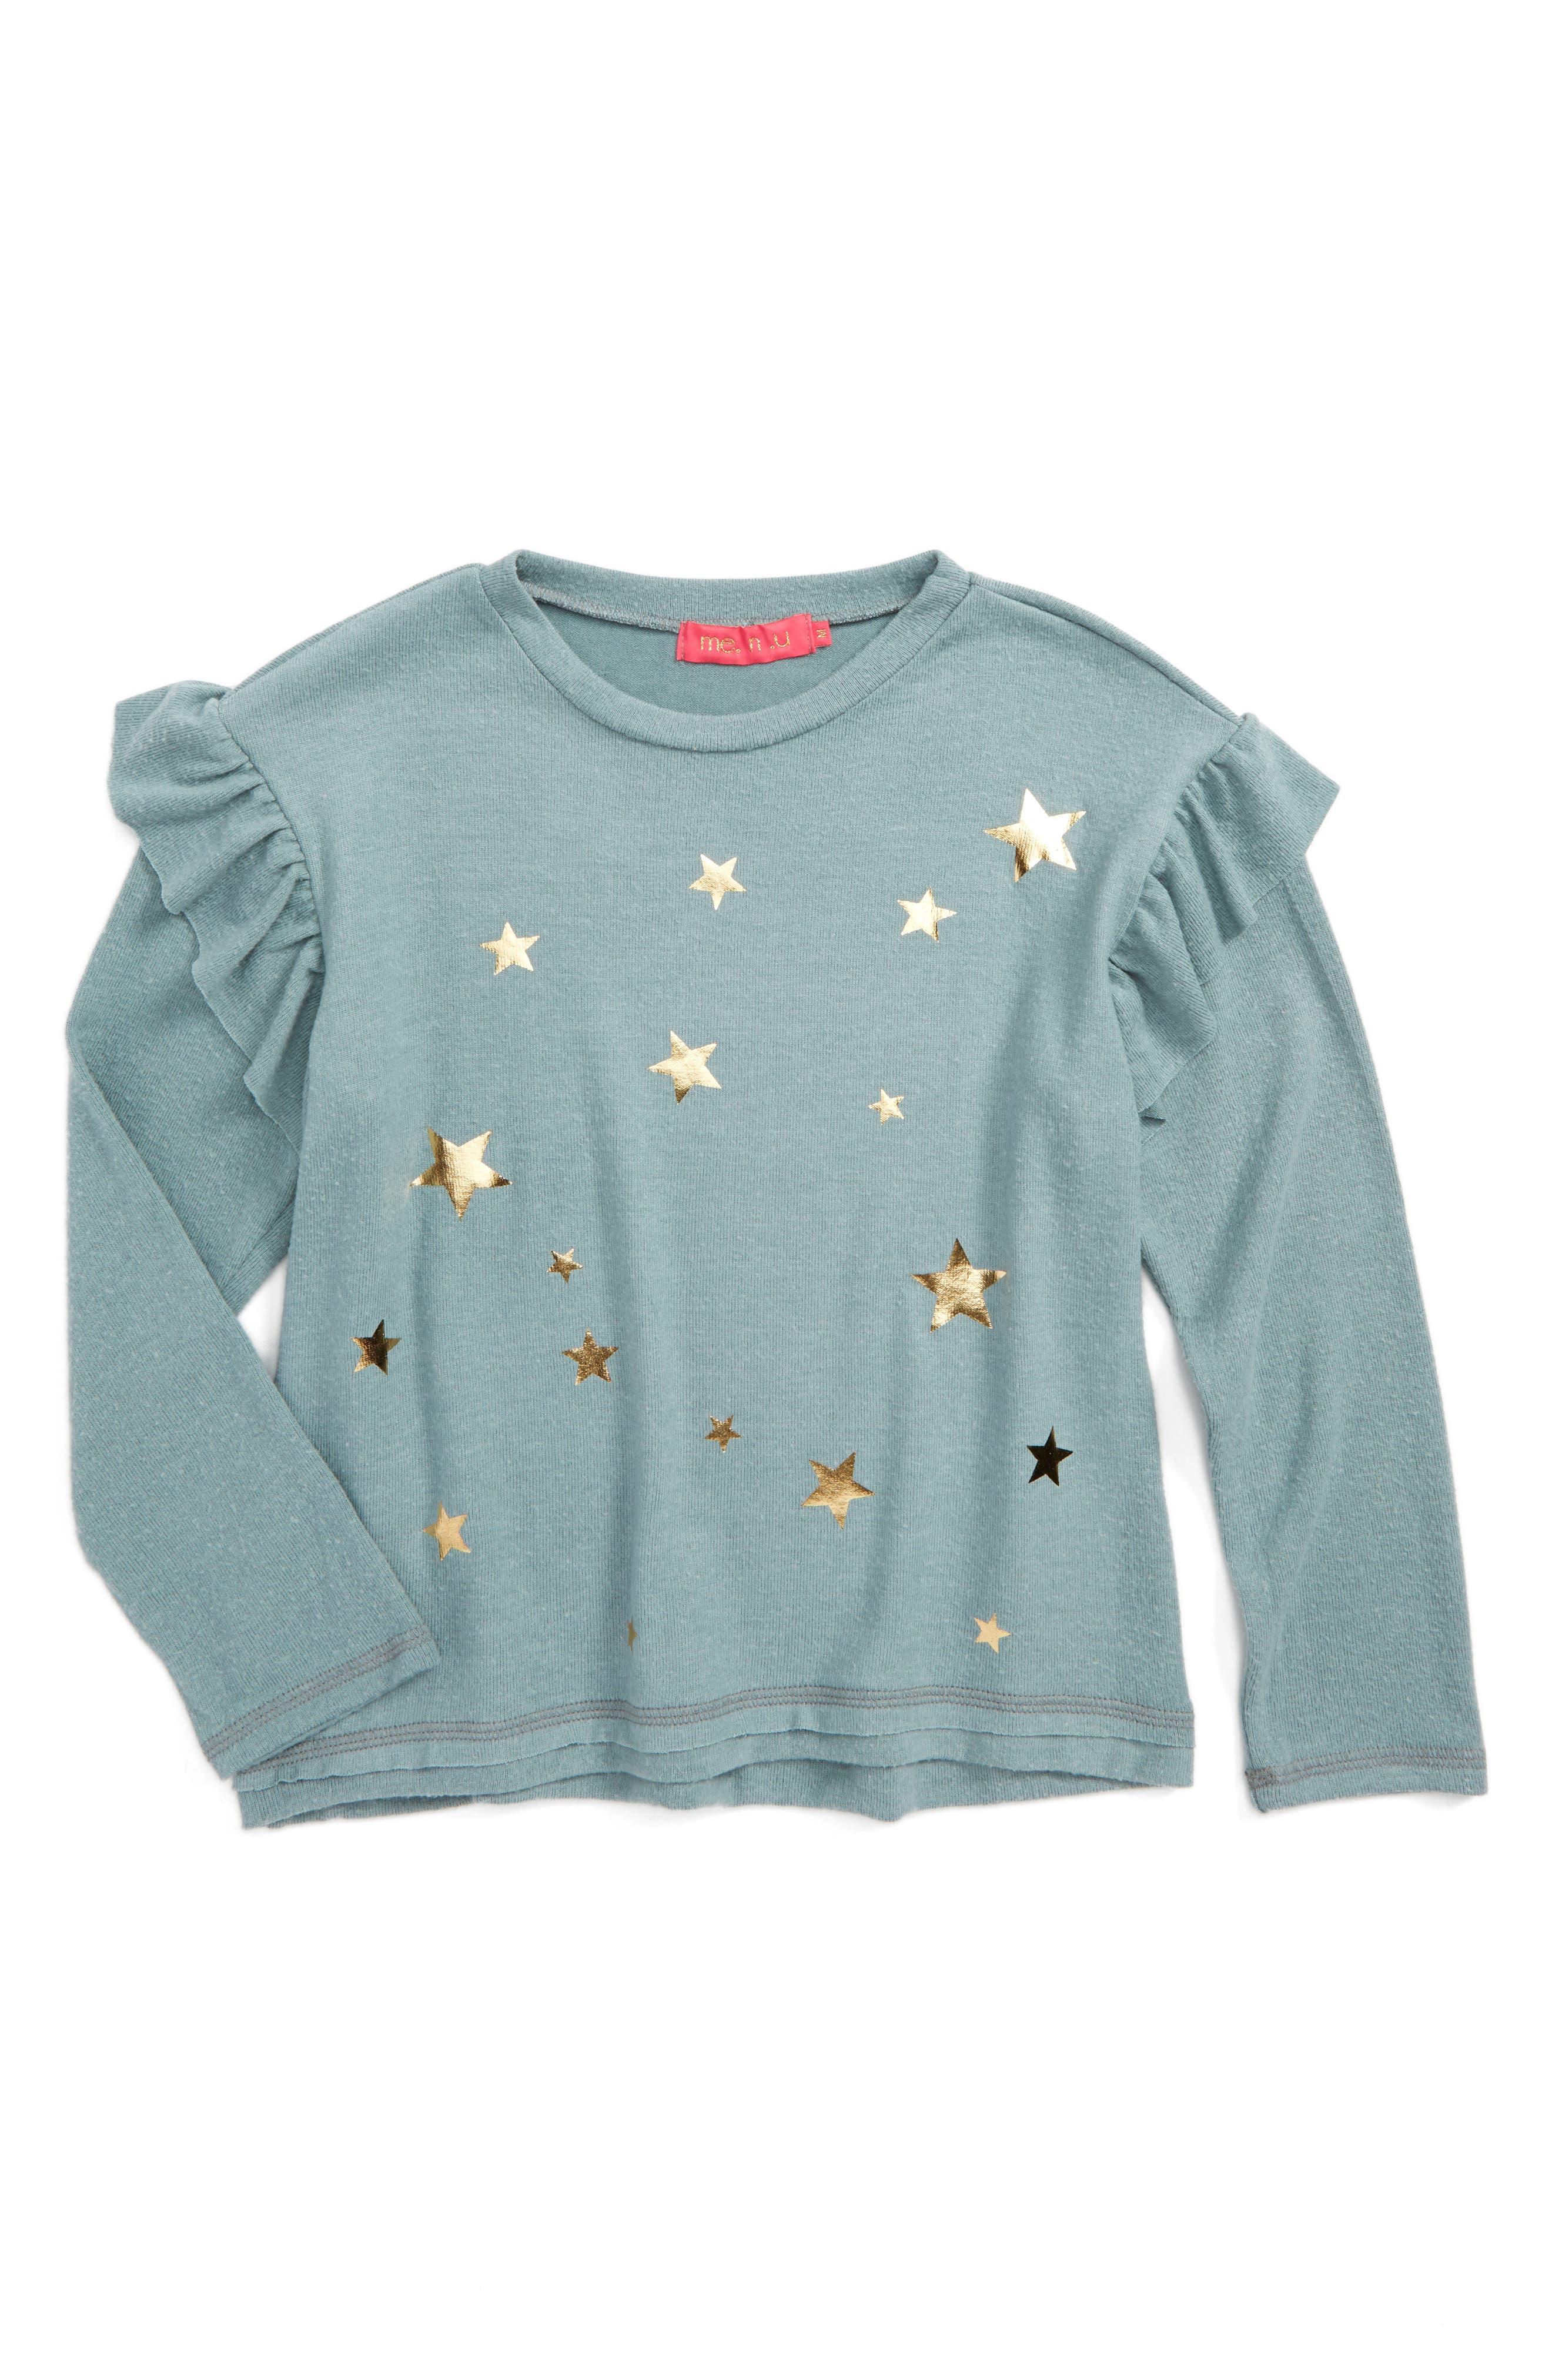 Alternate Image 1 Selected - me.n.u Star Print Ruffle Sweatshirt (Big Girls)